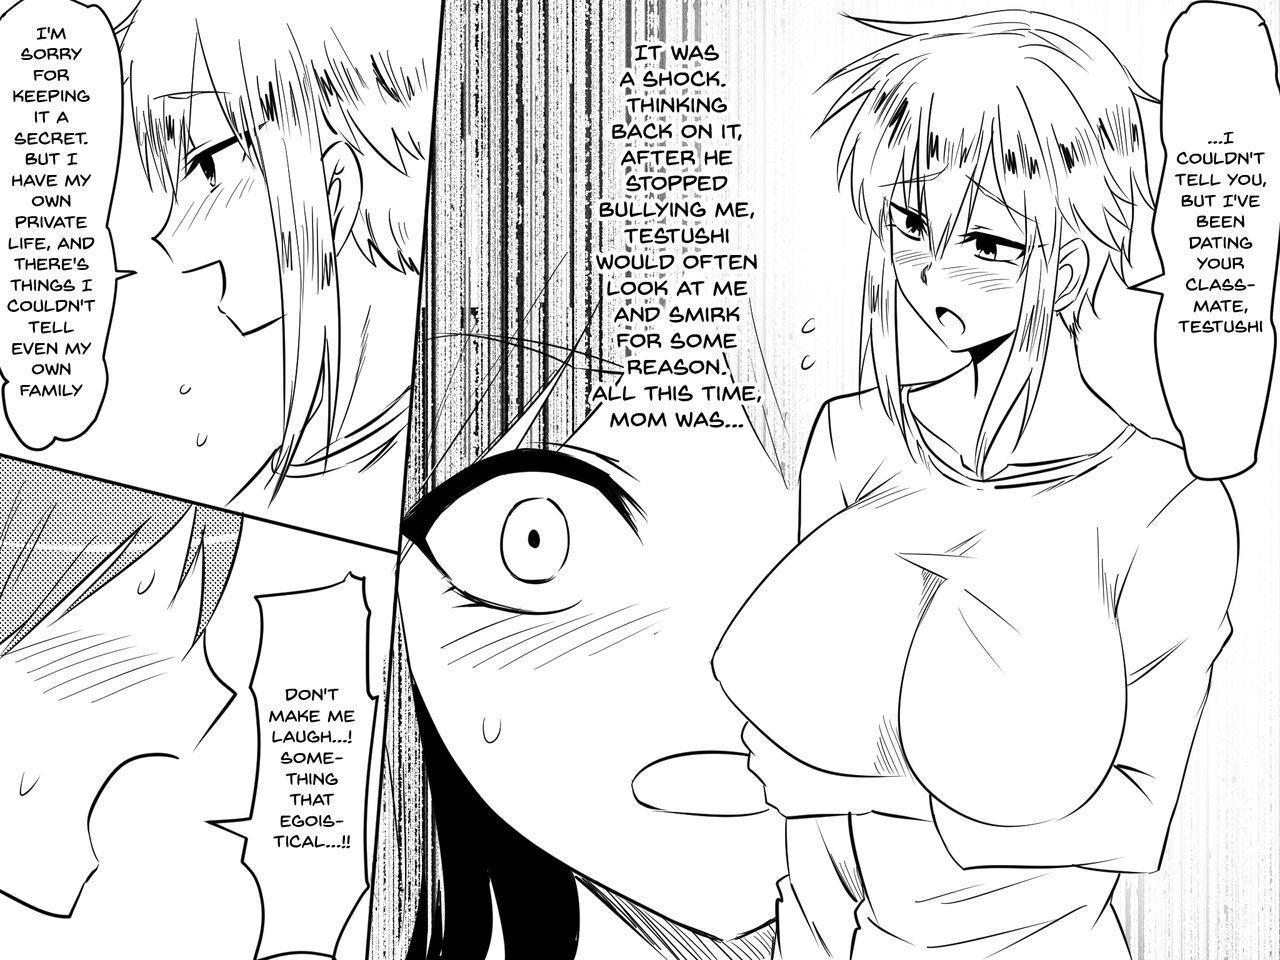 [Mikezoutei] Netorare Haha ~Kachiki de Kimottama no Okaa-san ga Boku o Ijimeru Aitsu no Onna ni Naru Hanashi~   Mom NTR ~A Story Of How My Gutsy Mom Ended Up Becoming My Bully's Plaything~ [English] {Doujins.com} 11